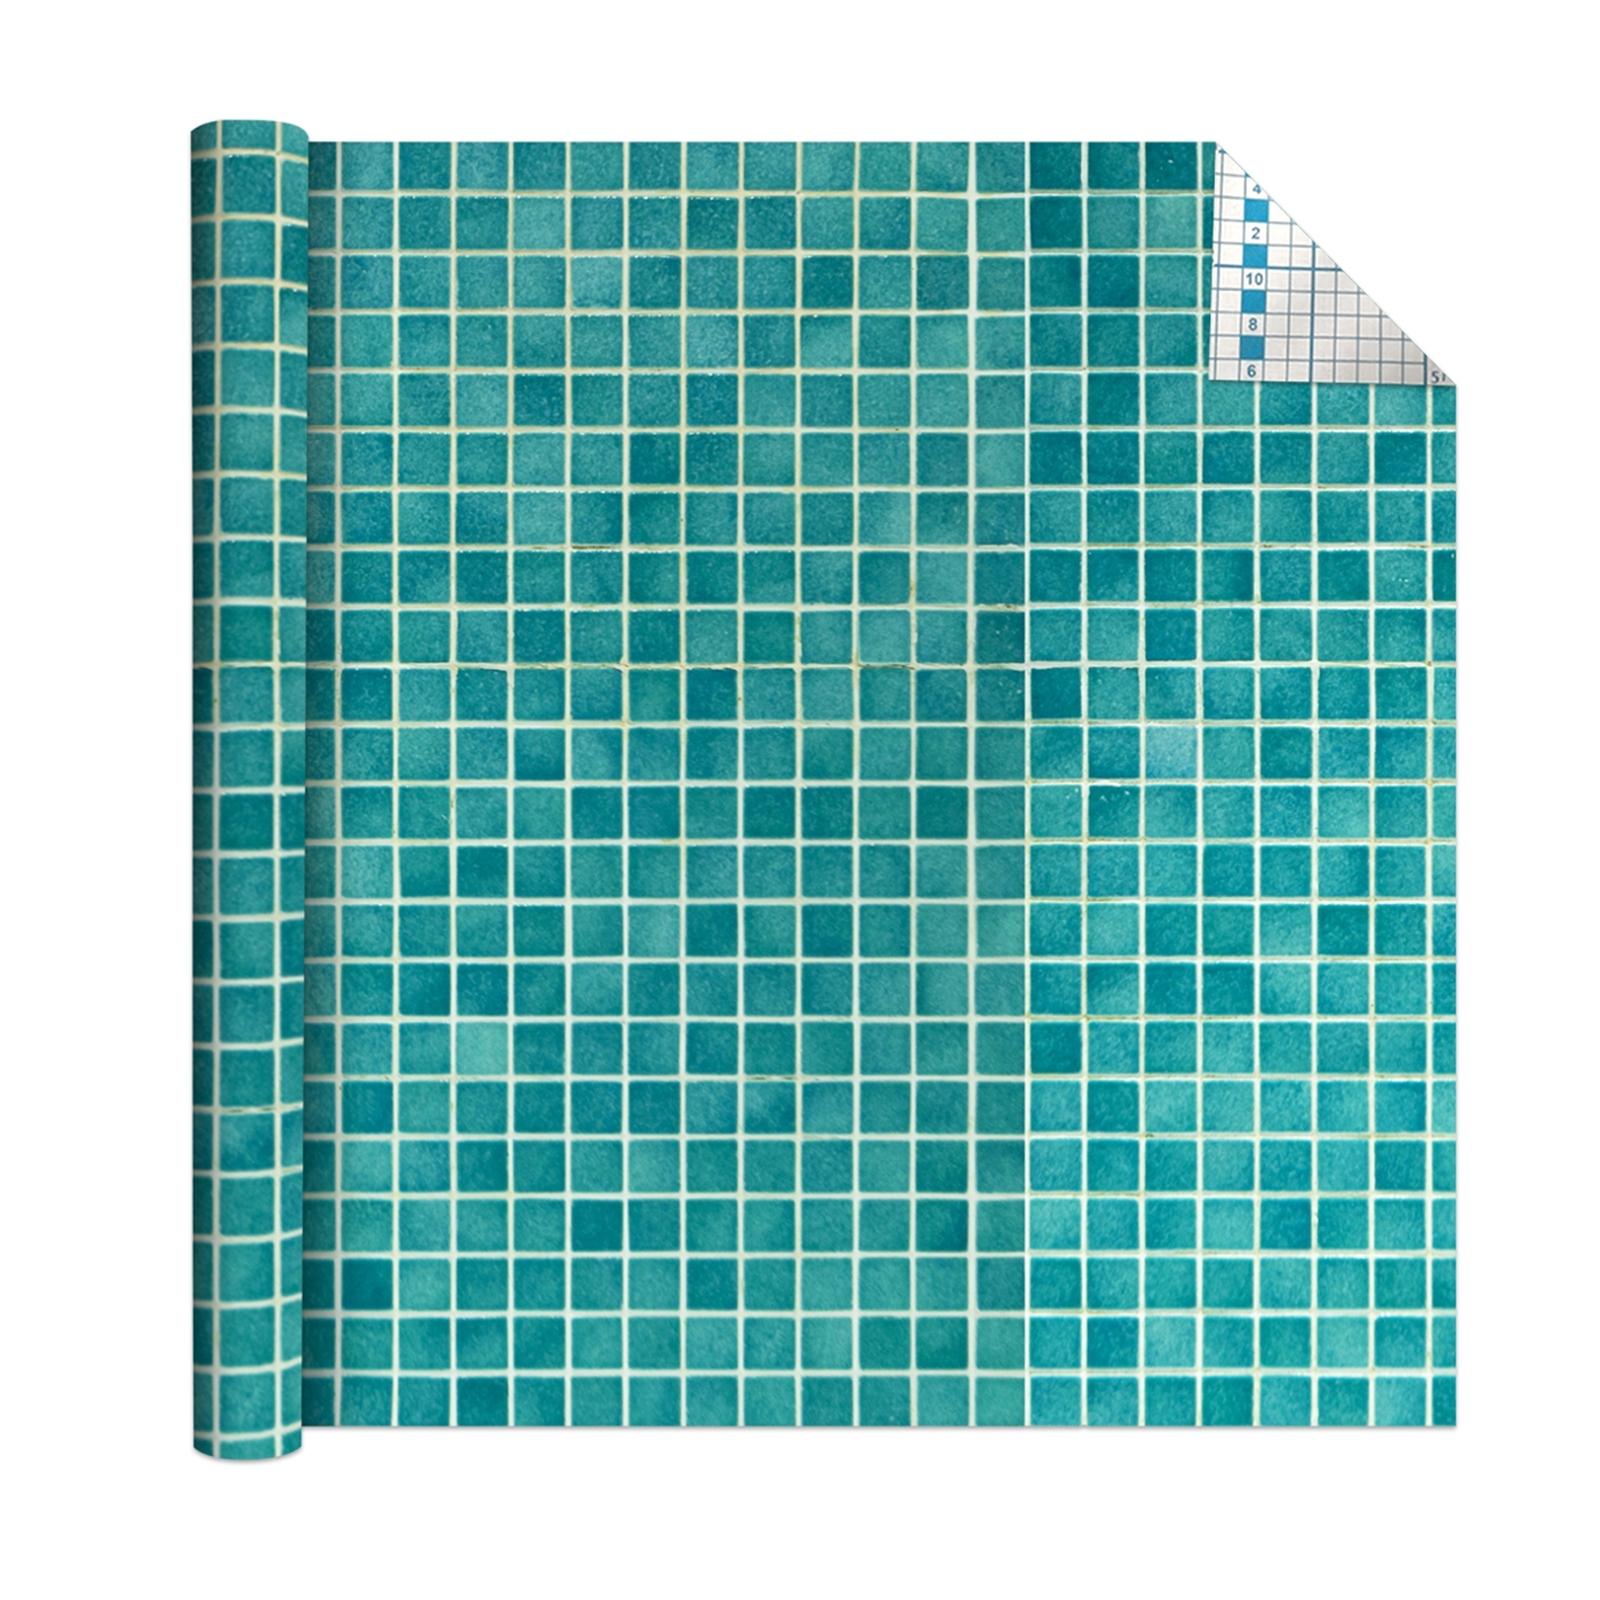 Boyle 1.5m x 45cm Peacock Mosaic Tile Self Adhesive Film